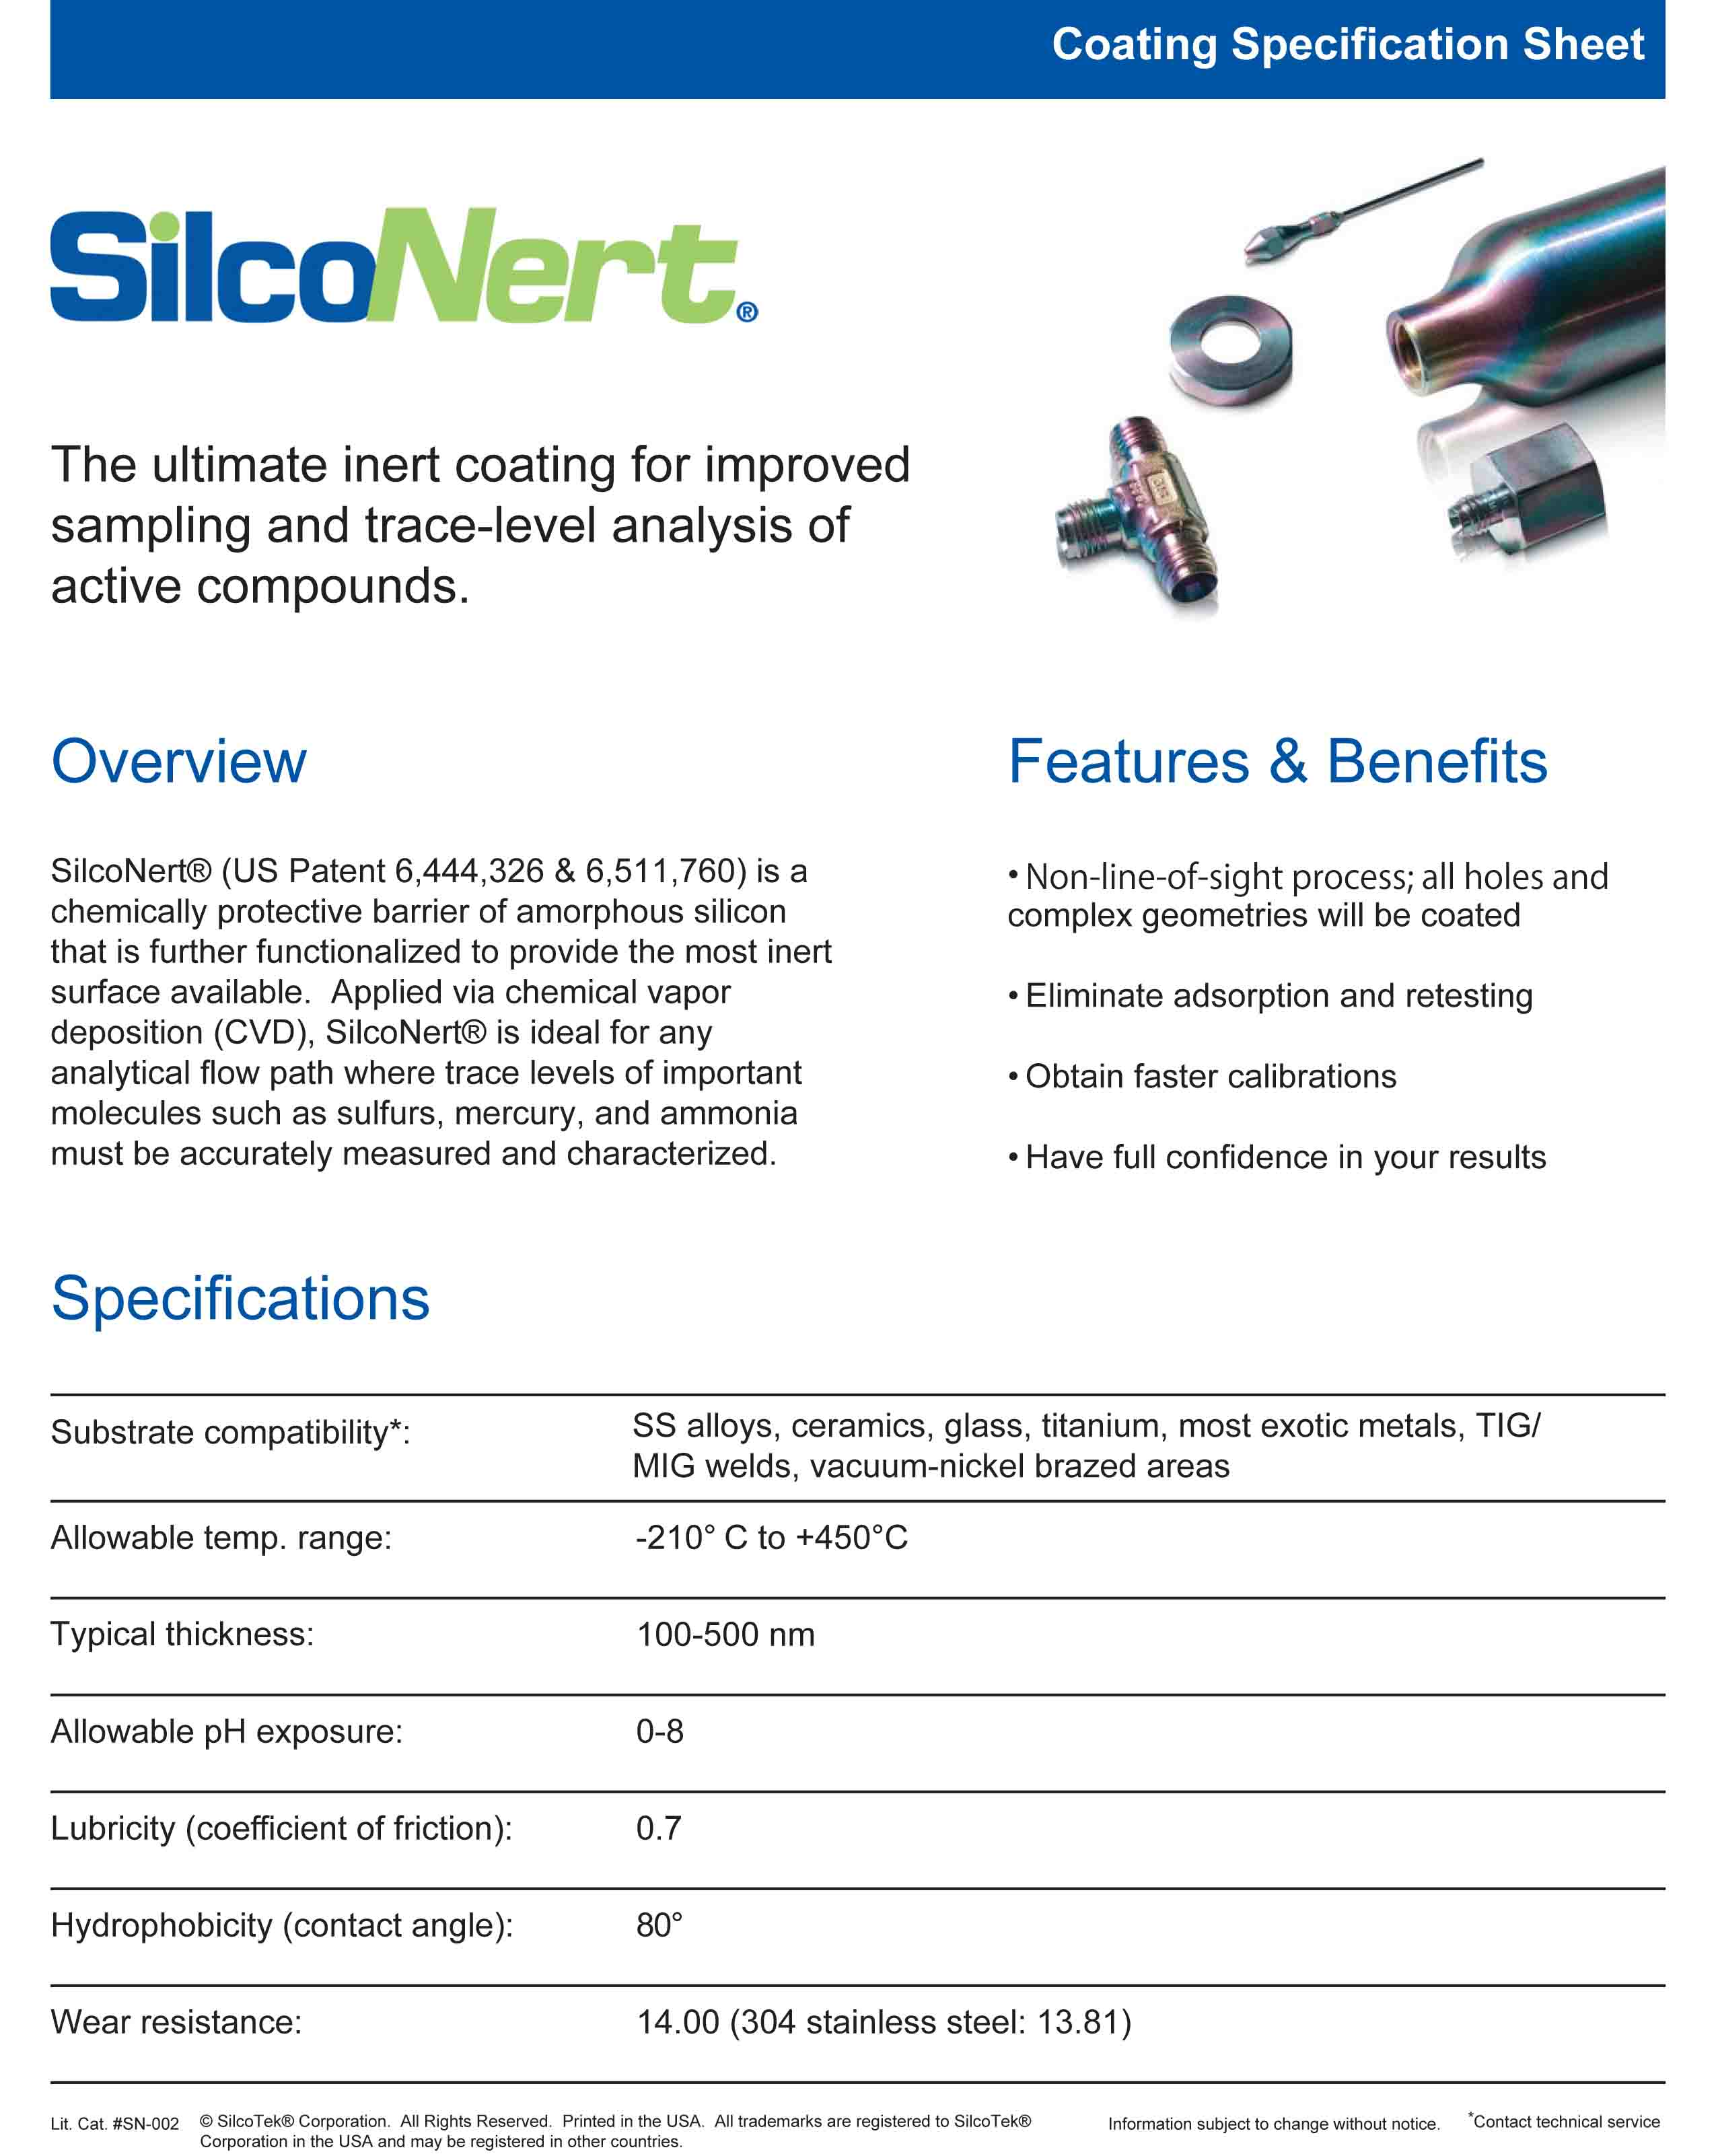 silconert_1000-coating-specification